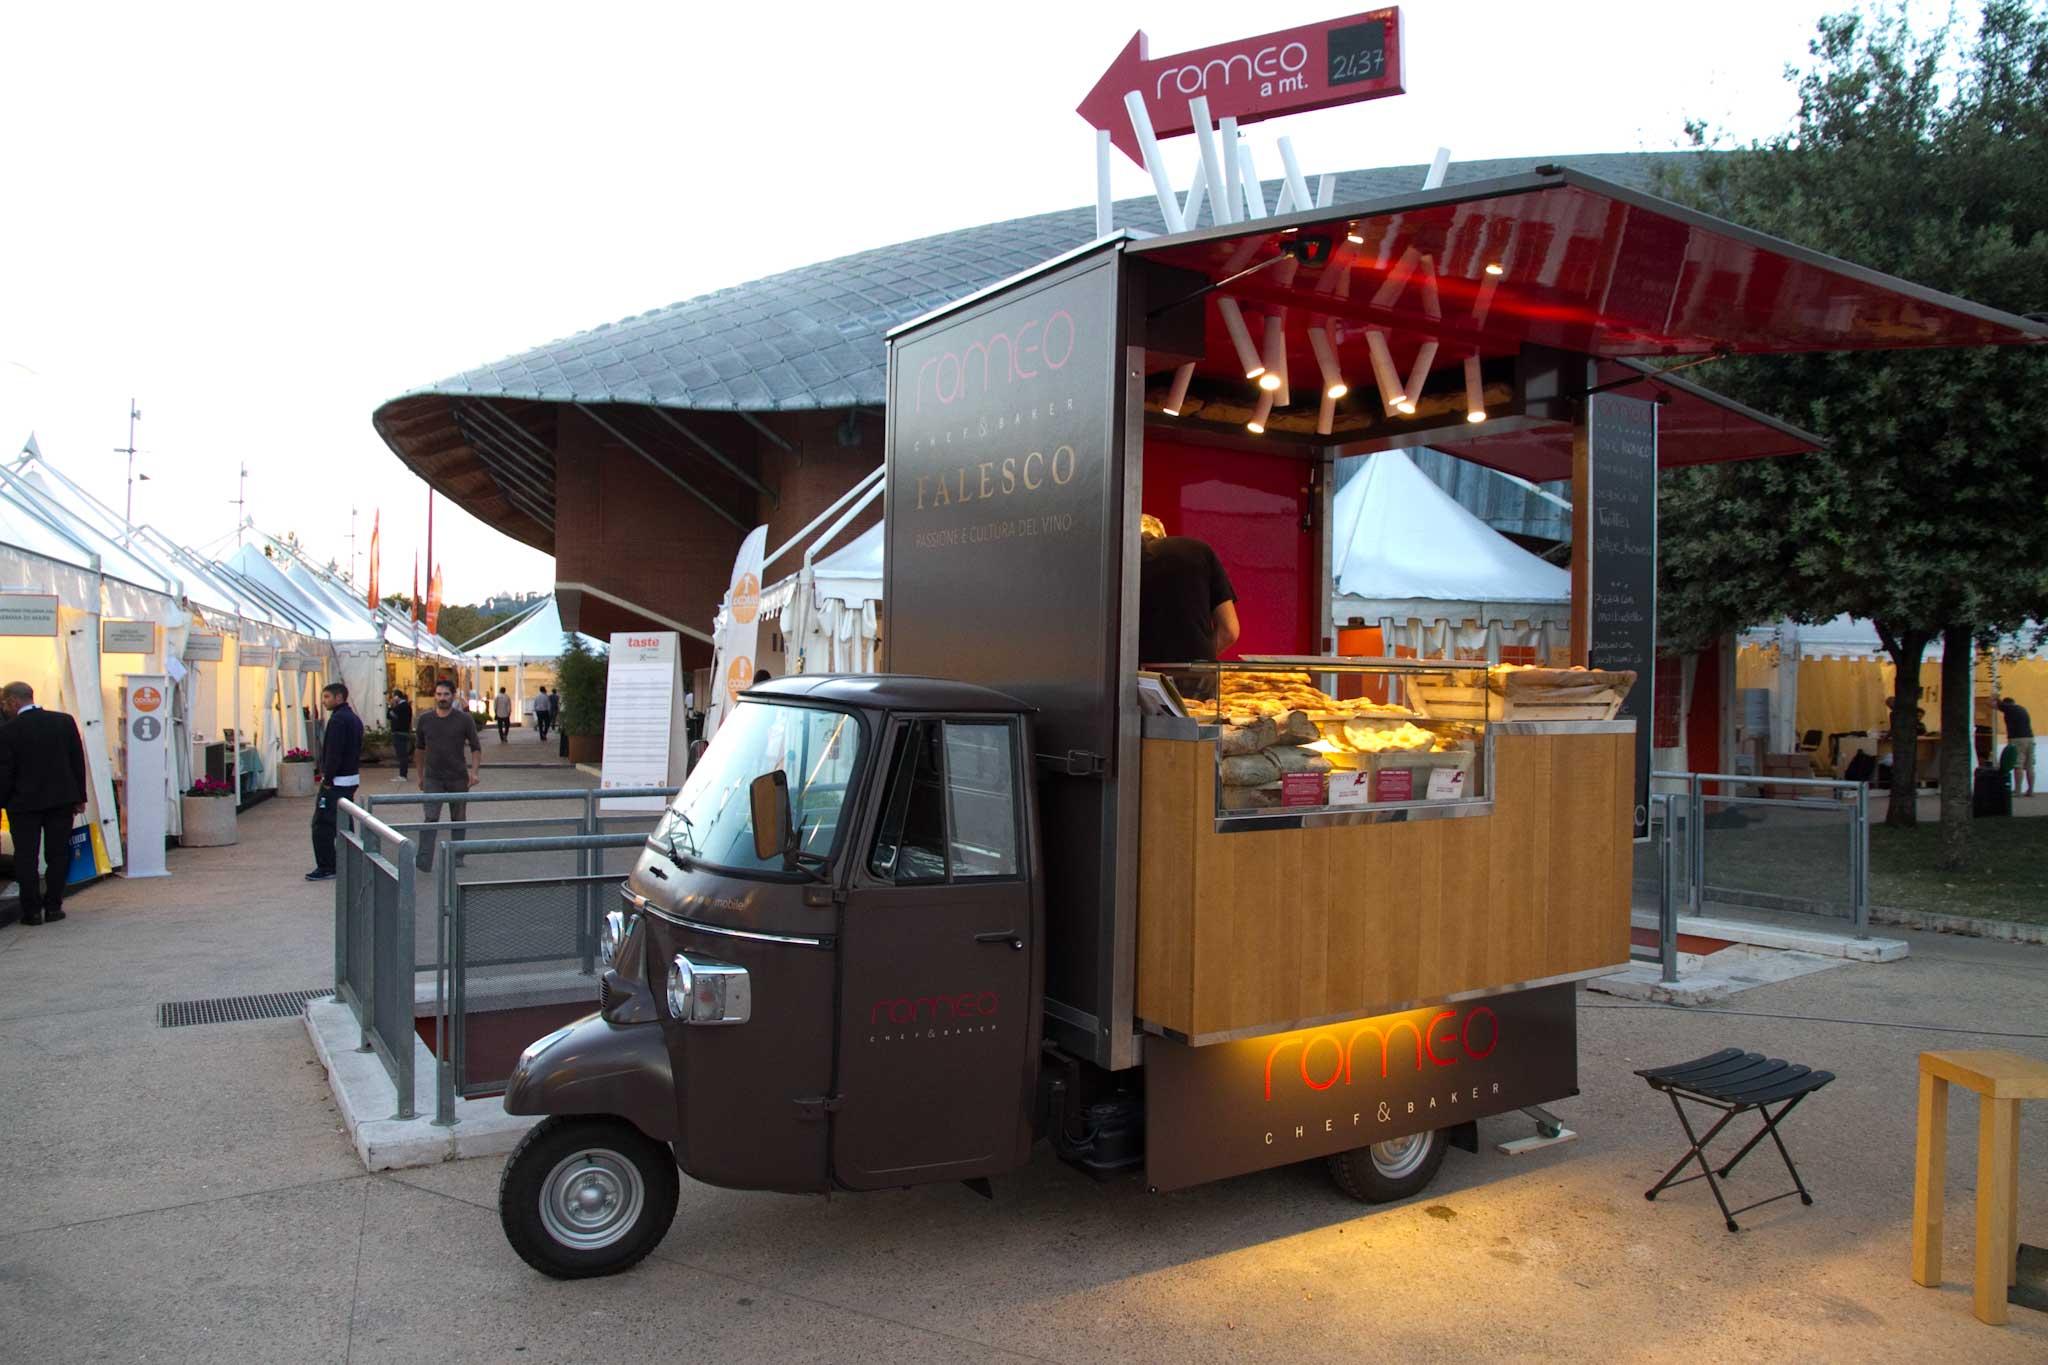 ape romeo-street food-eatinero-cibo di strada-panino